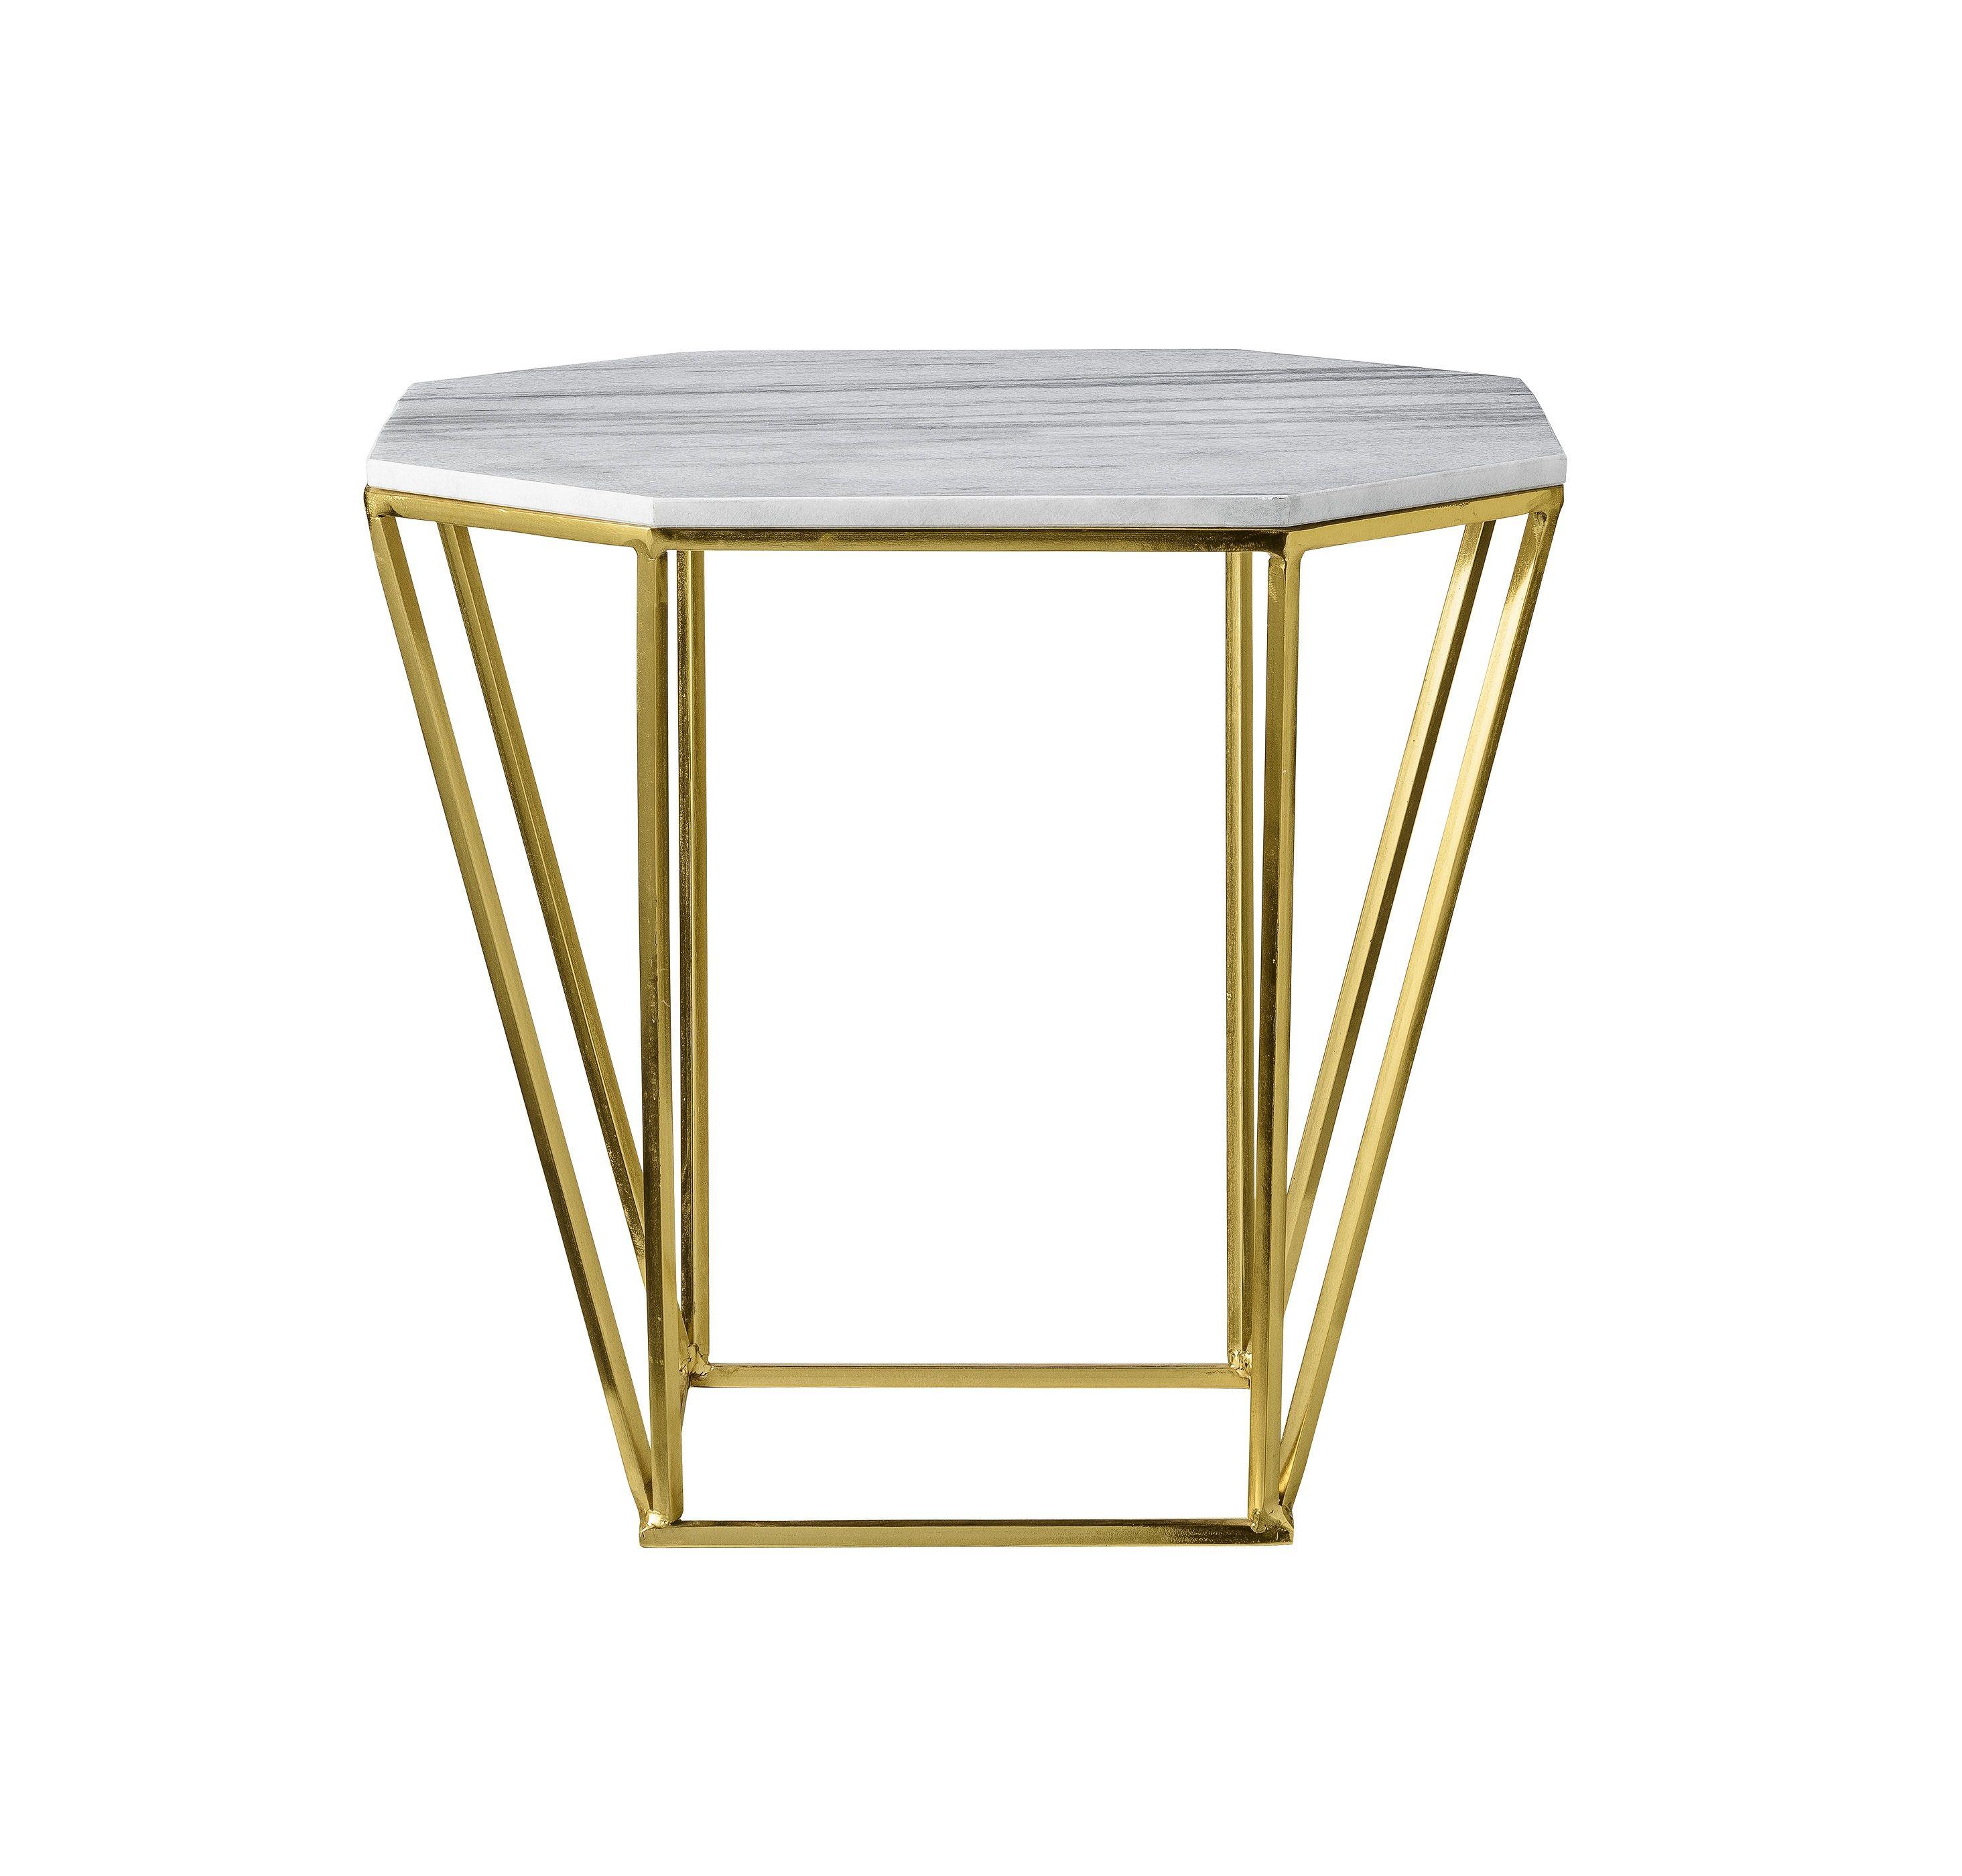 Beistelltisch Marmor couchtisch metric metall marmor gold my home is my castle